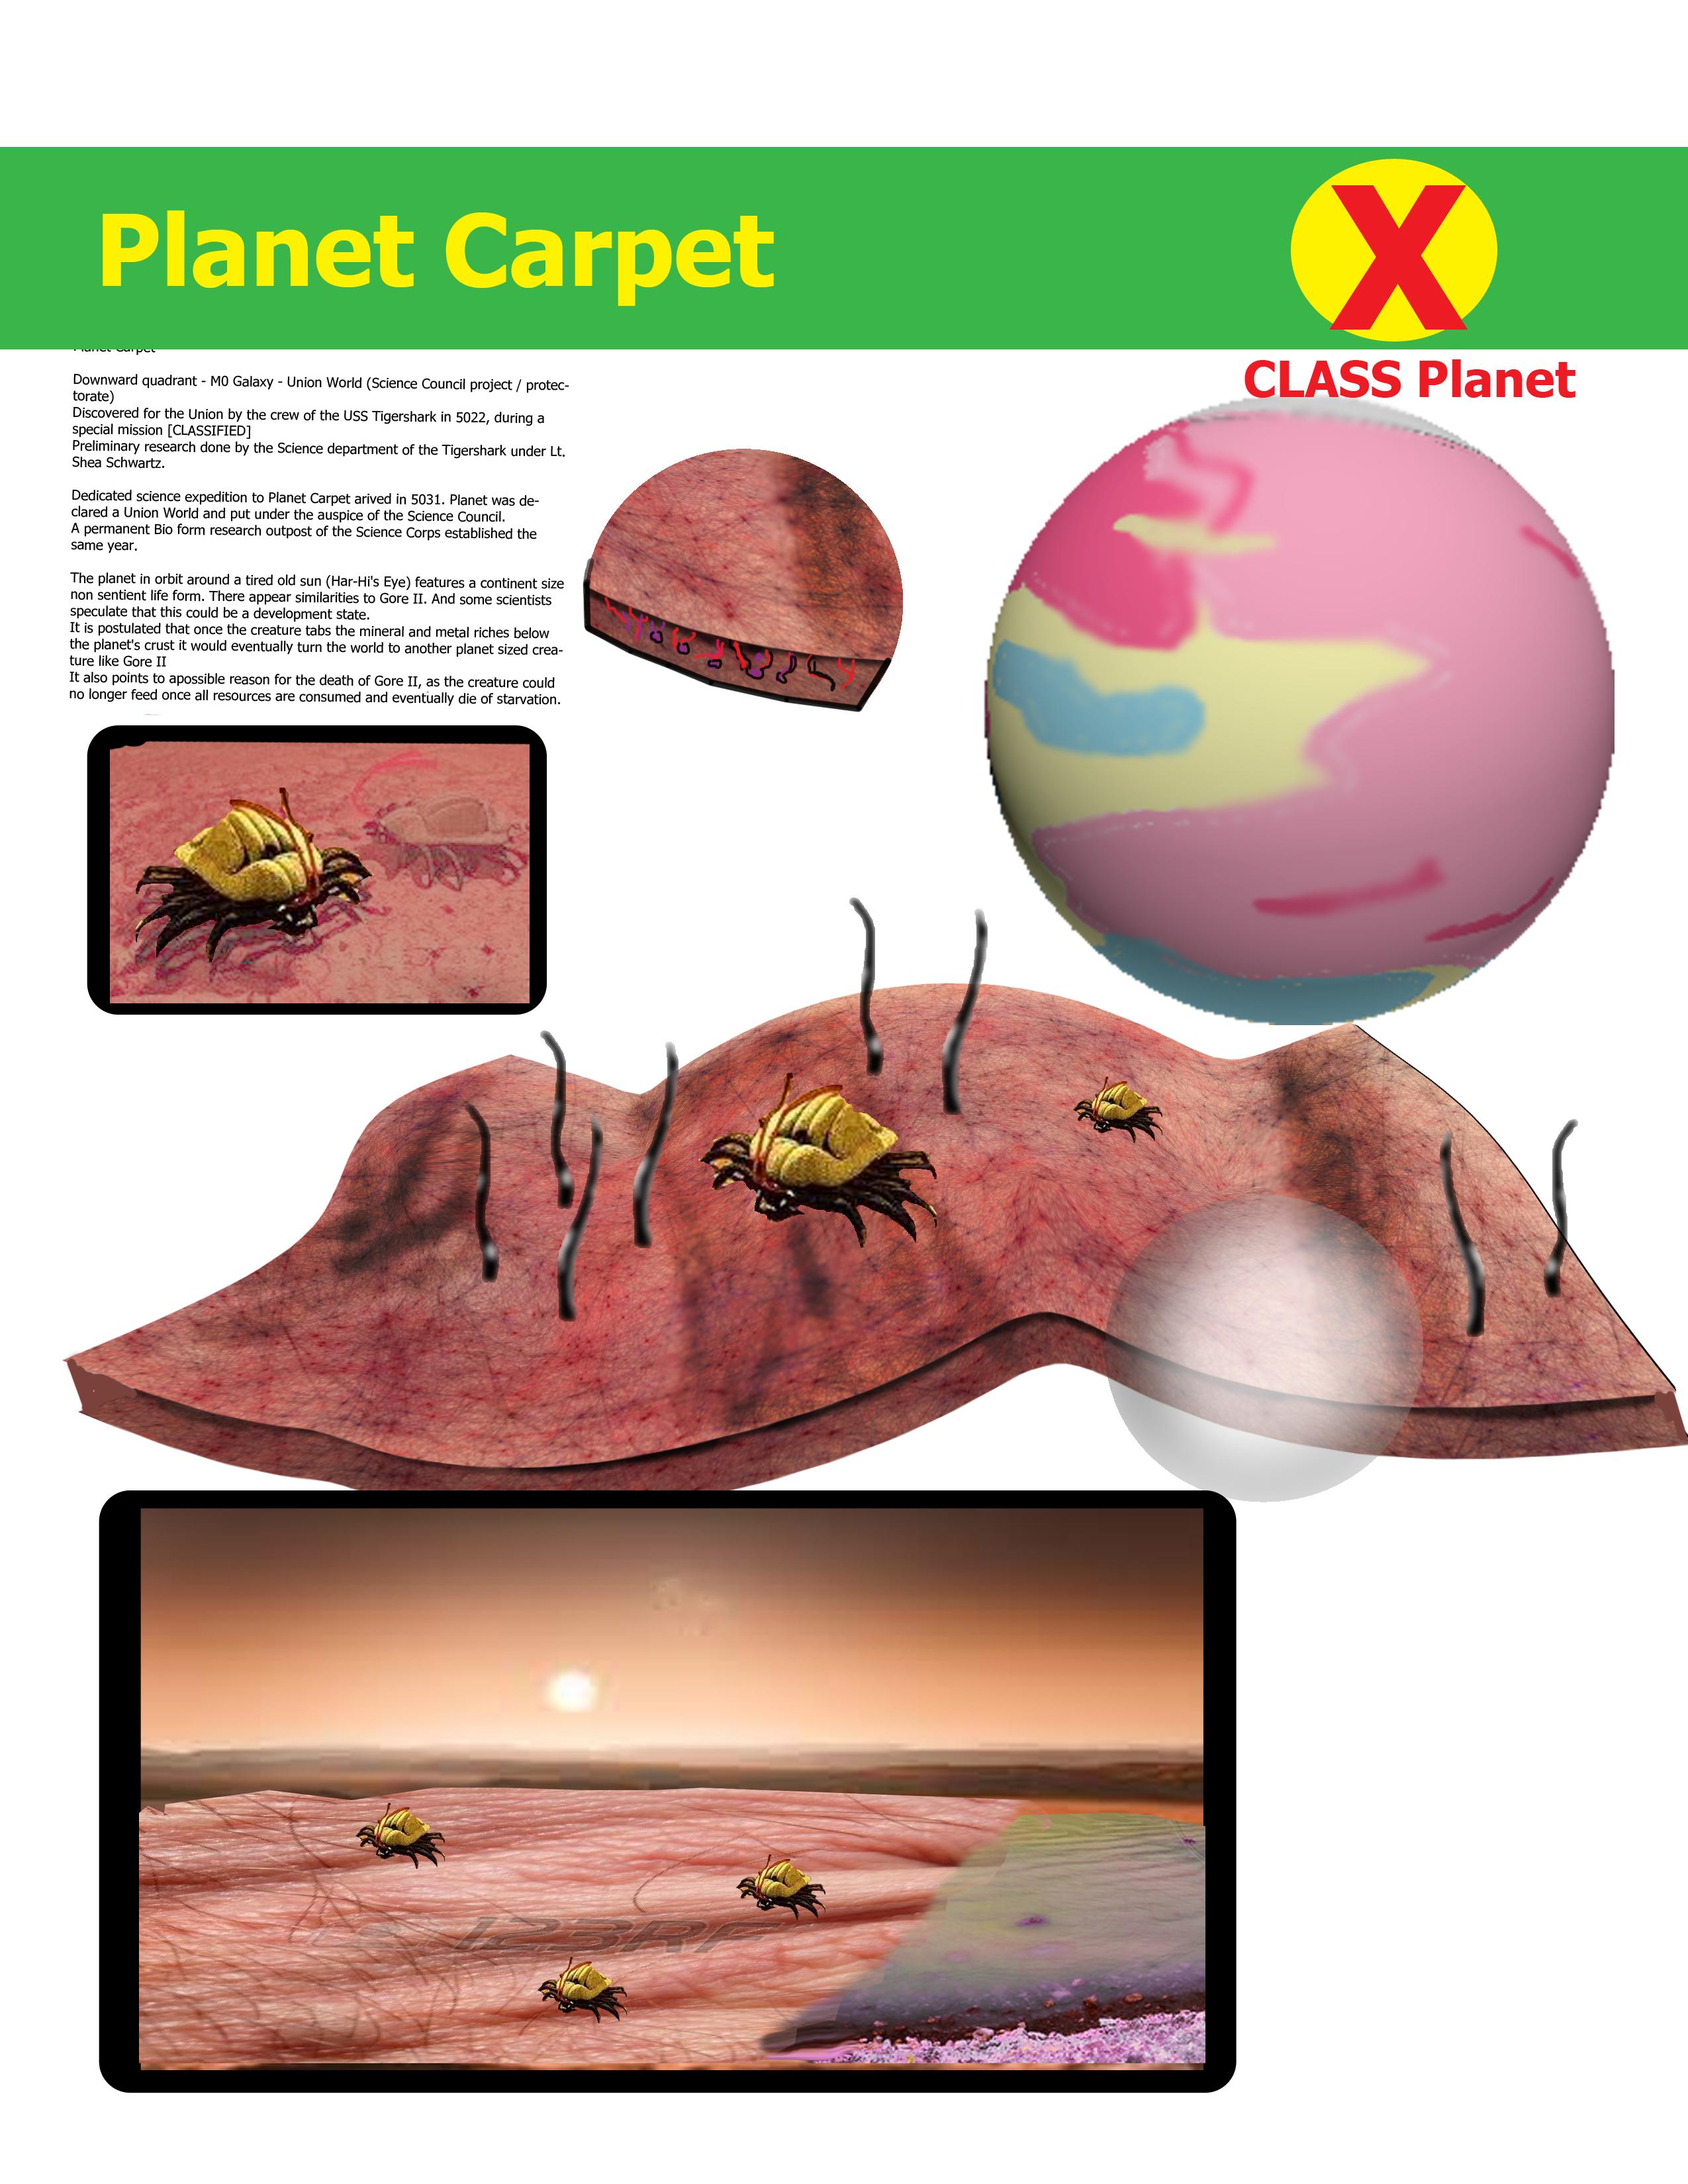 Carpet,Planet